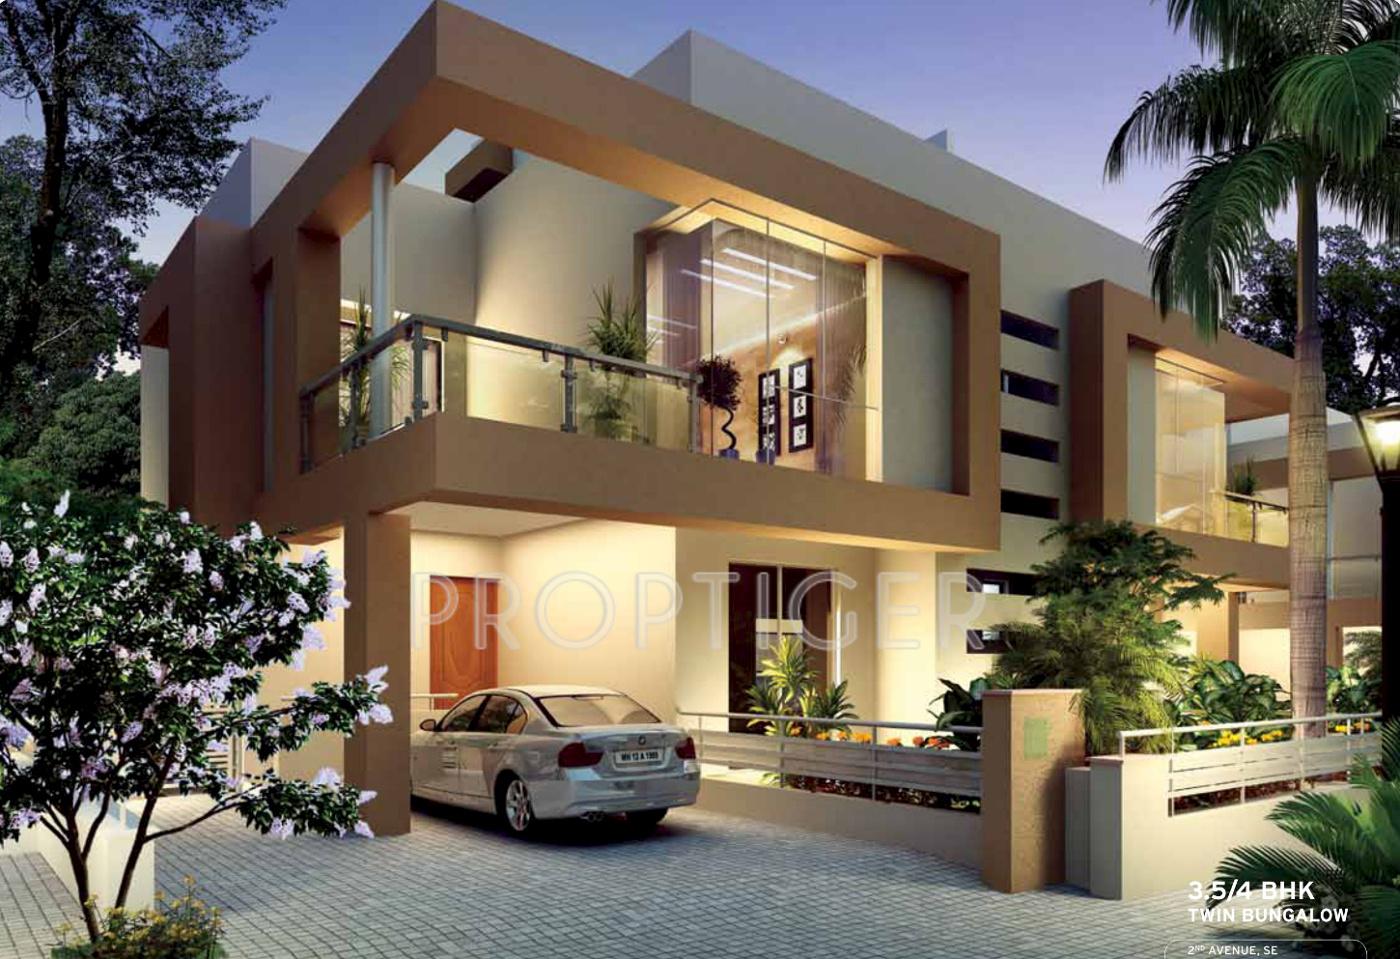 Kolte patil twin bungalows and villa in hinjewadi pune for Villas 2018